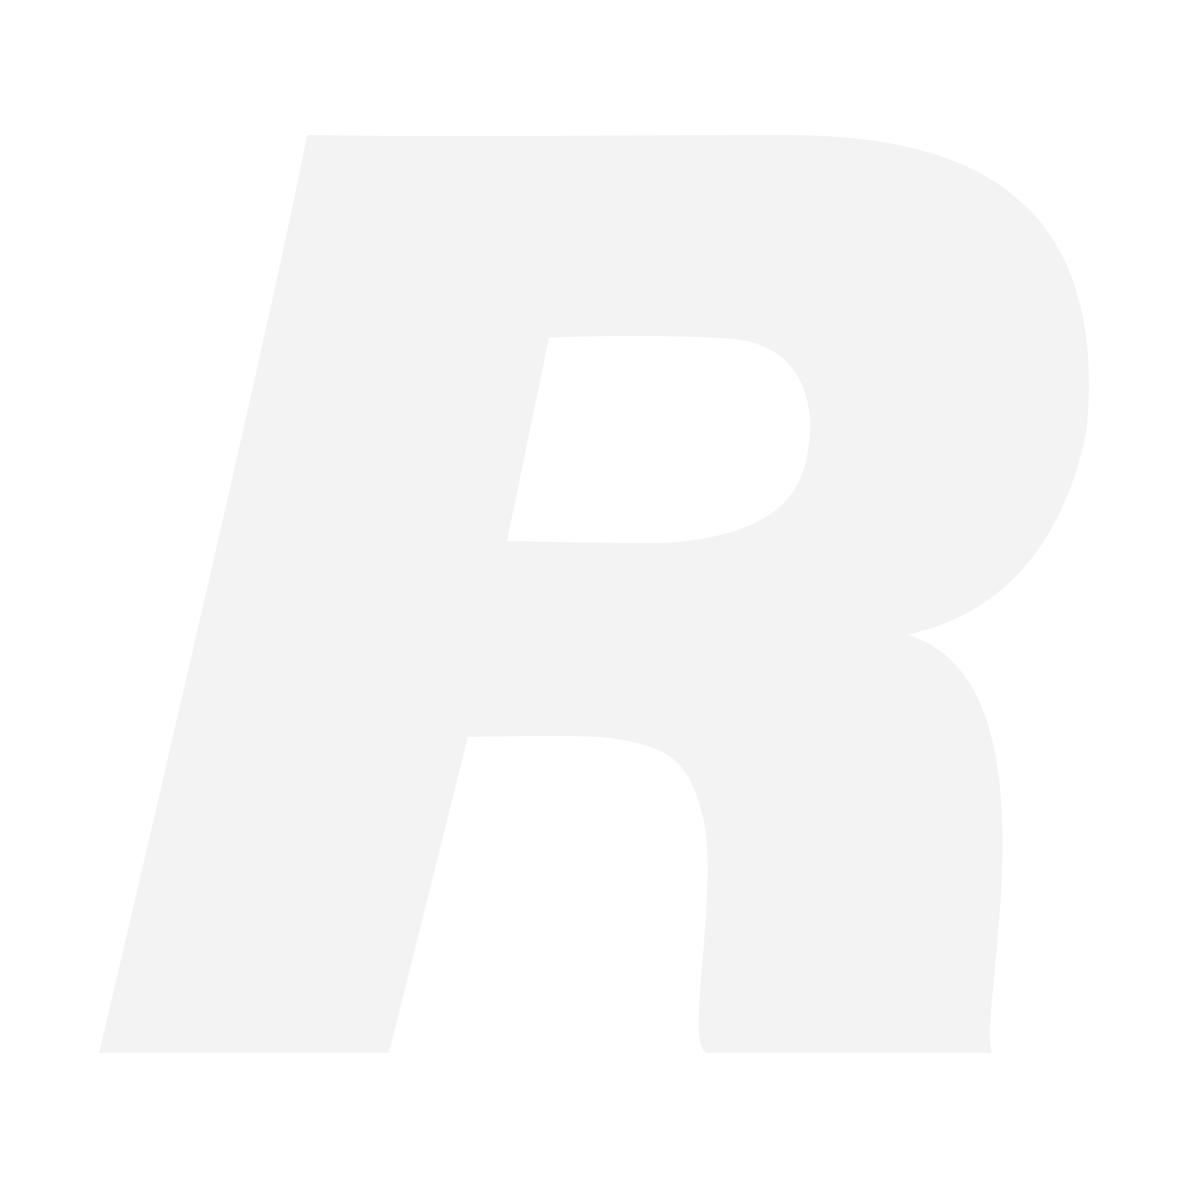 SONY LHP-1 LENS HOOD (RX-1)